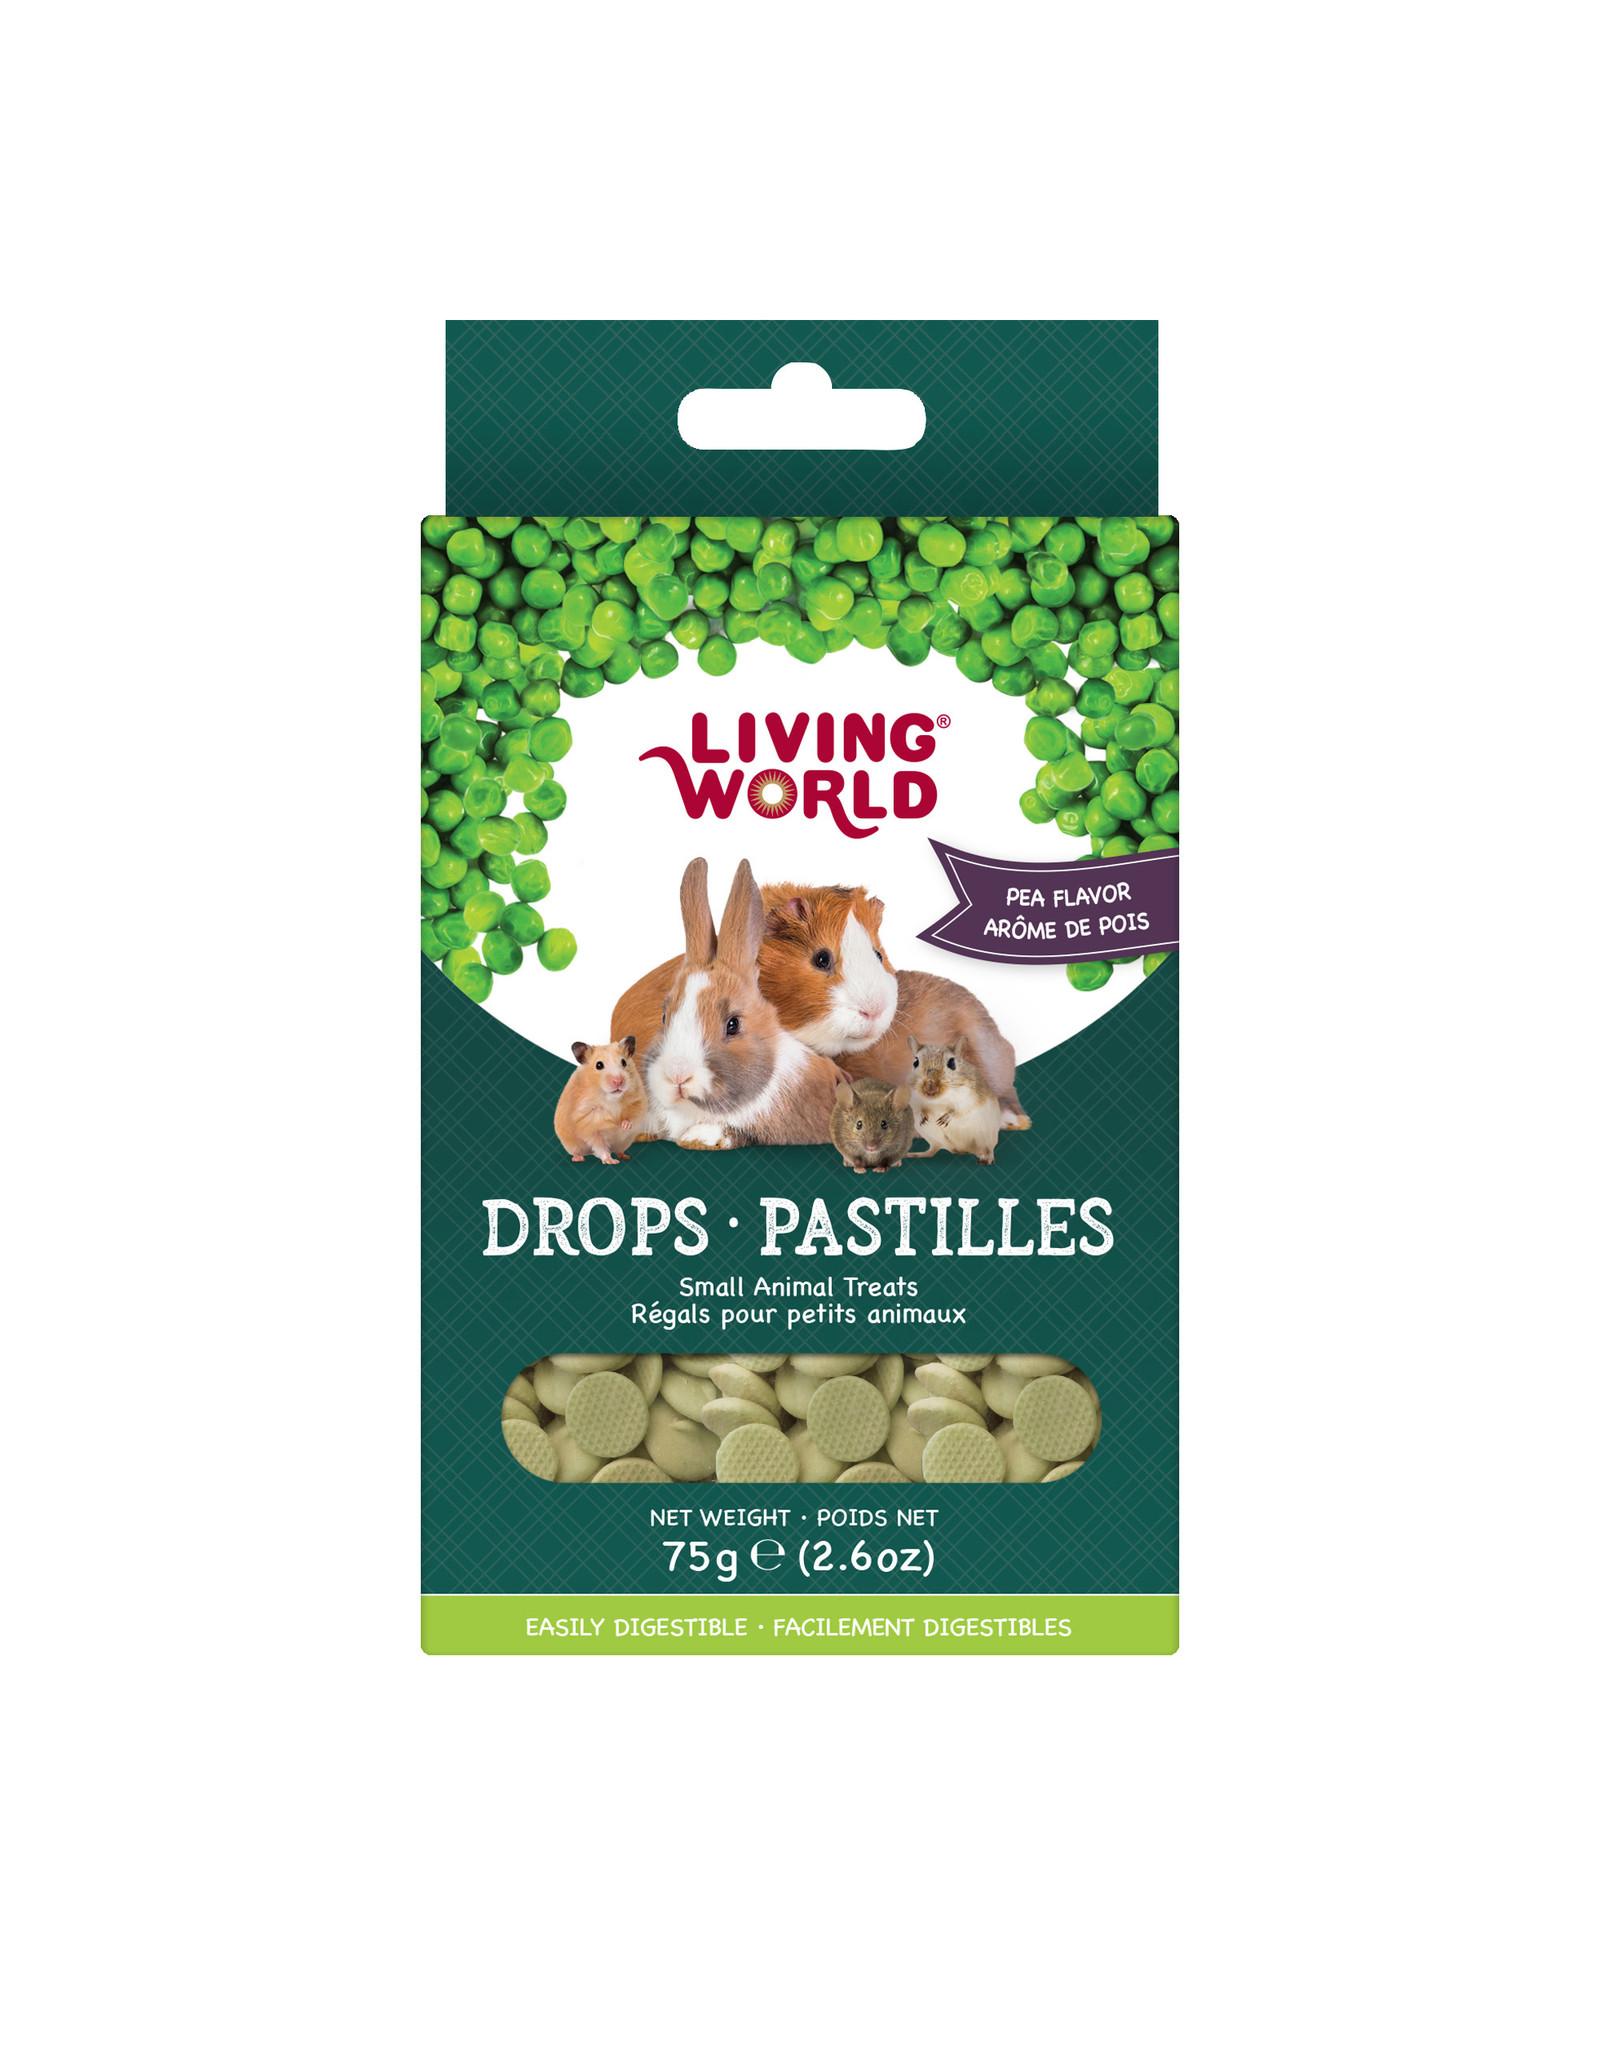 Living World Living World Small Animal Drops, Pea Flavour, 75 g (2.6 oz)